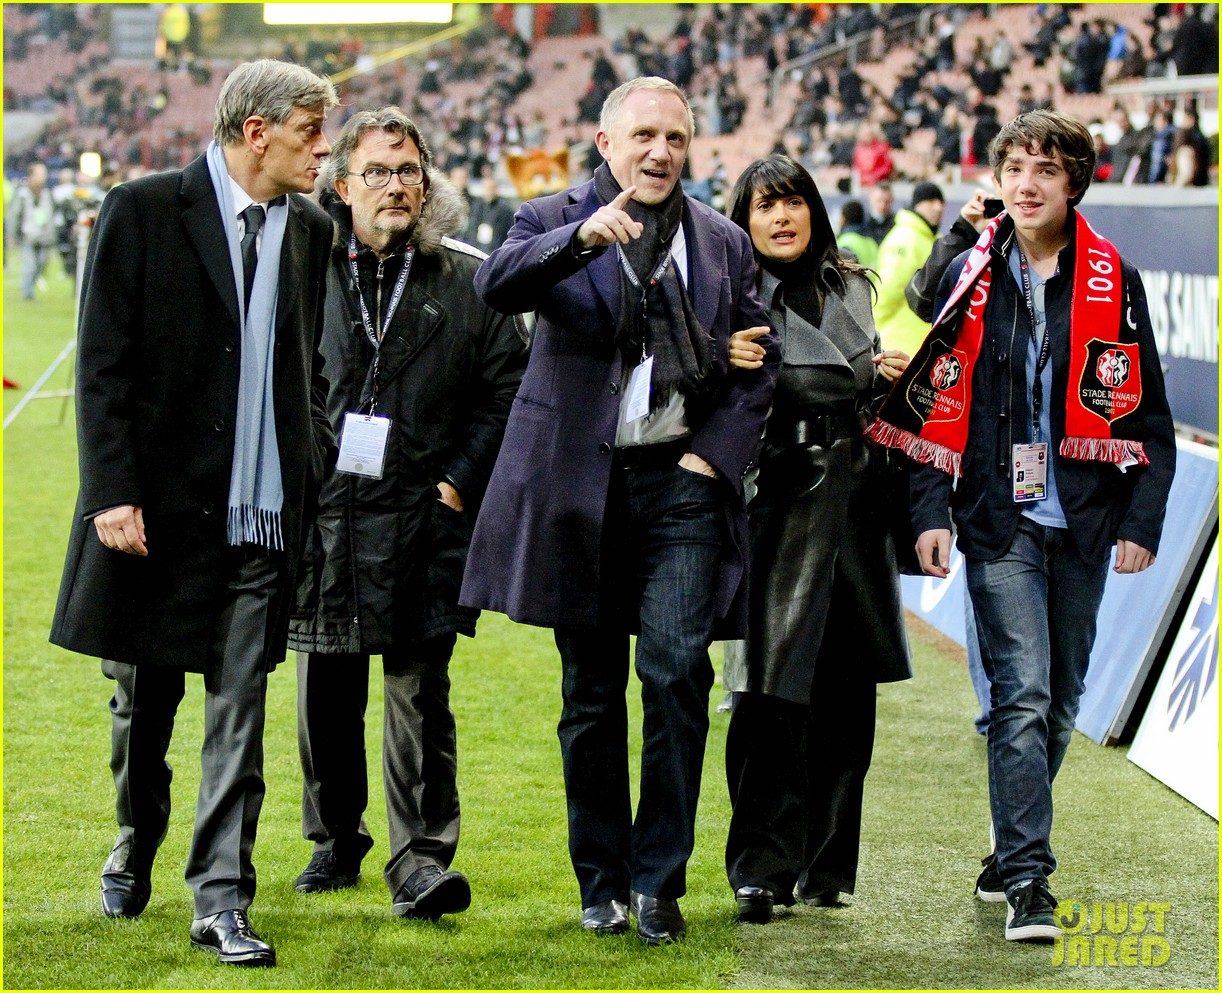 salma hayek french first league soccer fan 052759935